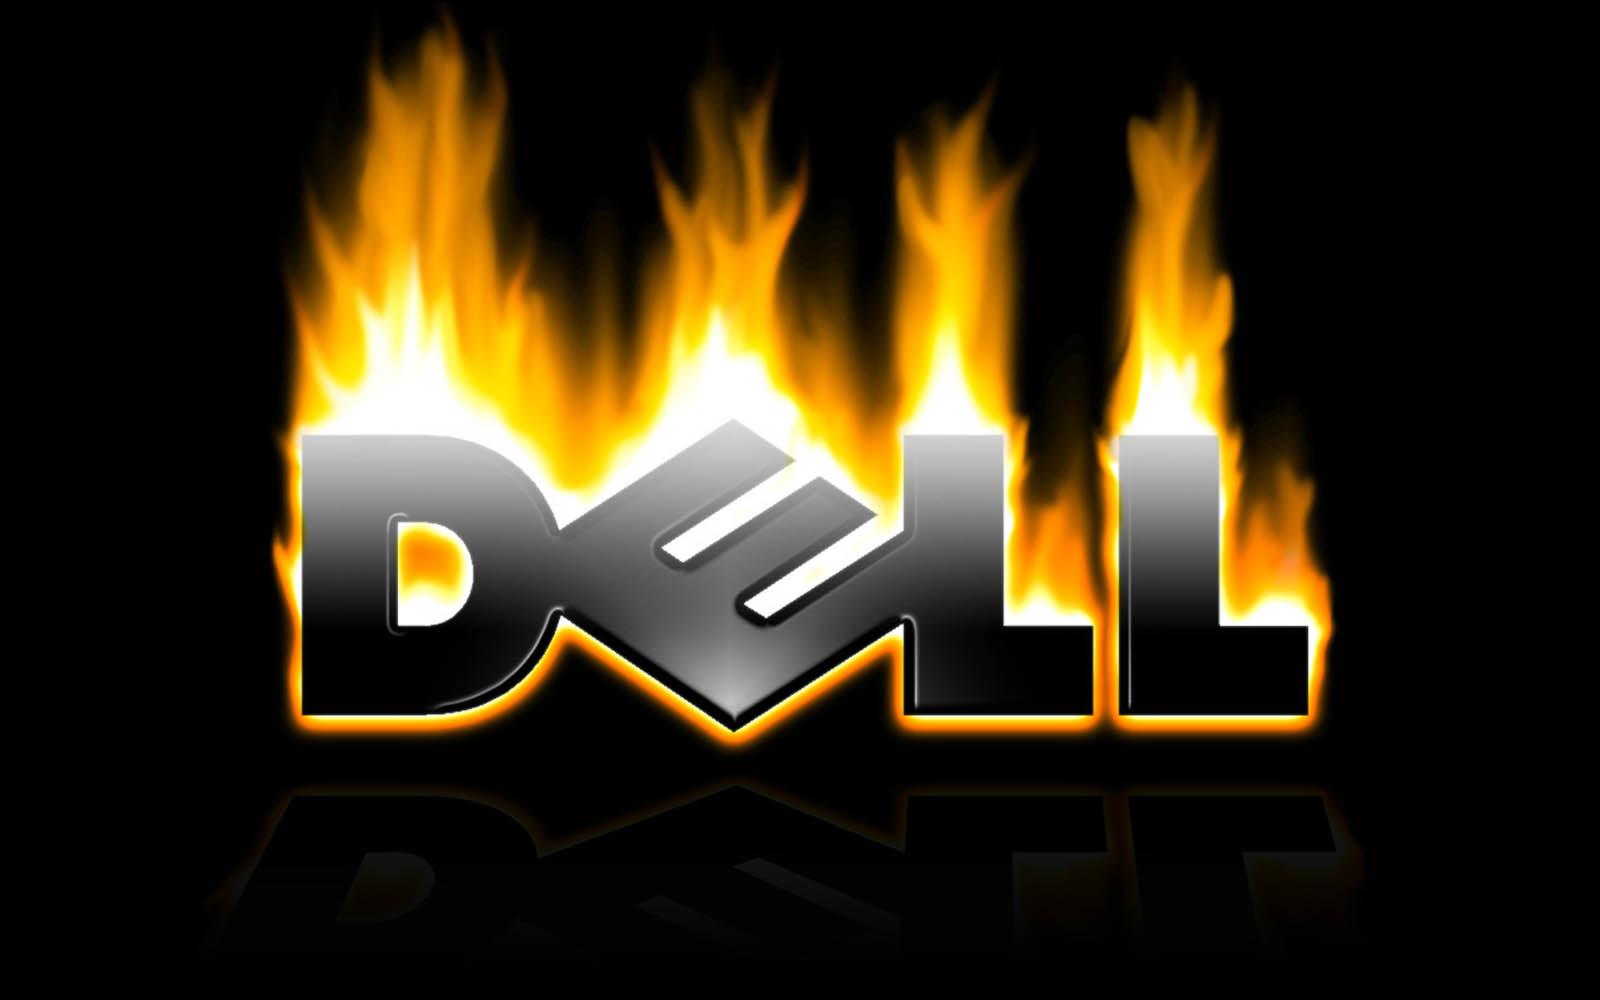 http://4.bp.blogspot.com/-dvuLBbXW-4Y/UBAle_KHbcI/AAAAAAAAGHo/n4spKDF5NuU/s1600/Dell%20Wallpapers.jpg